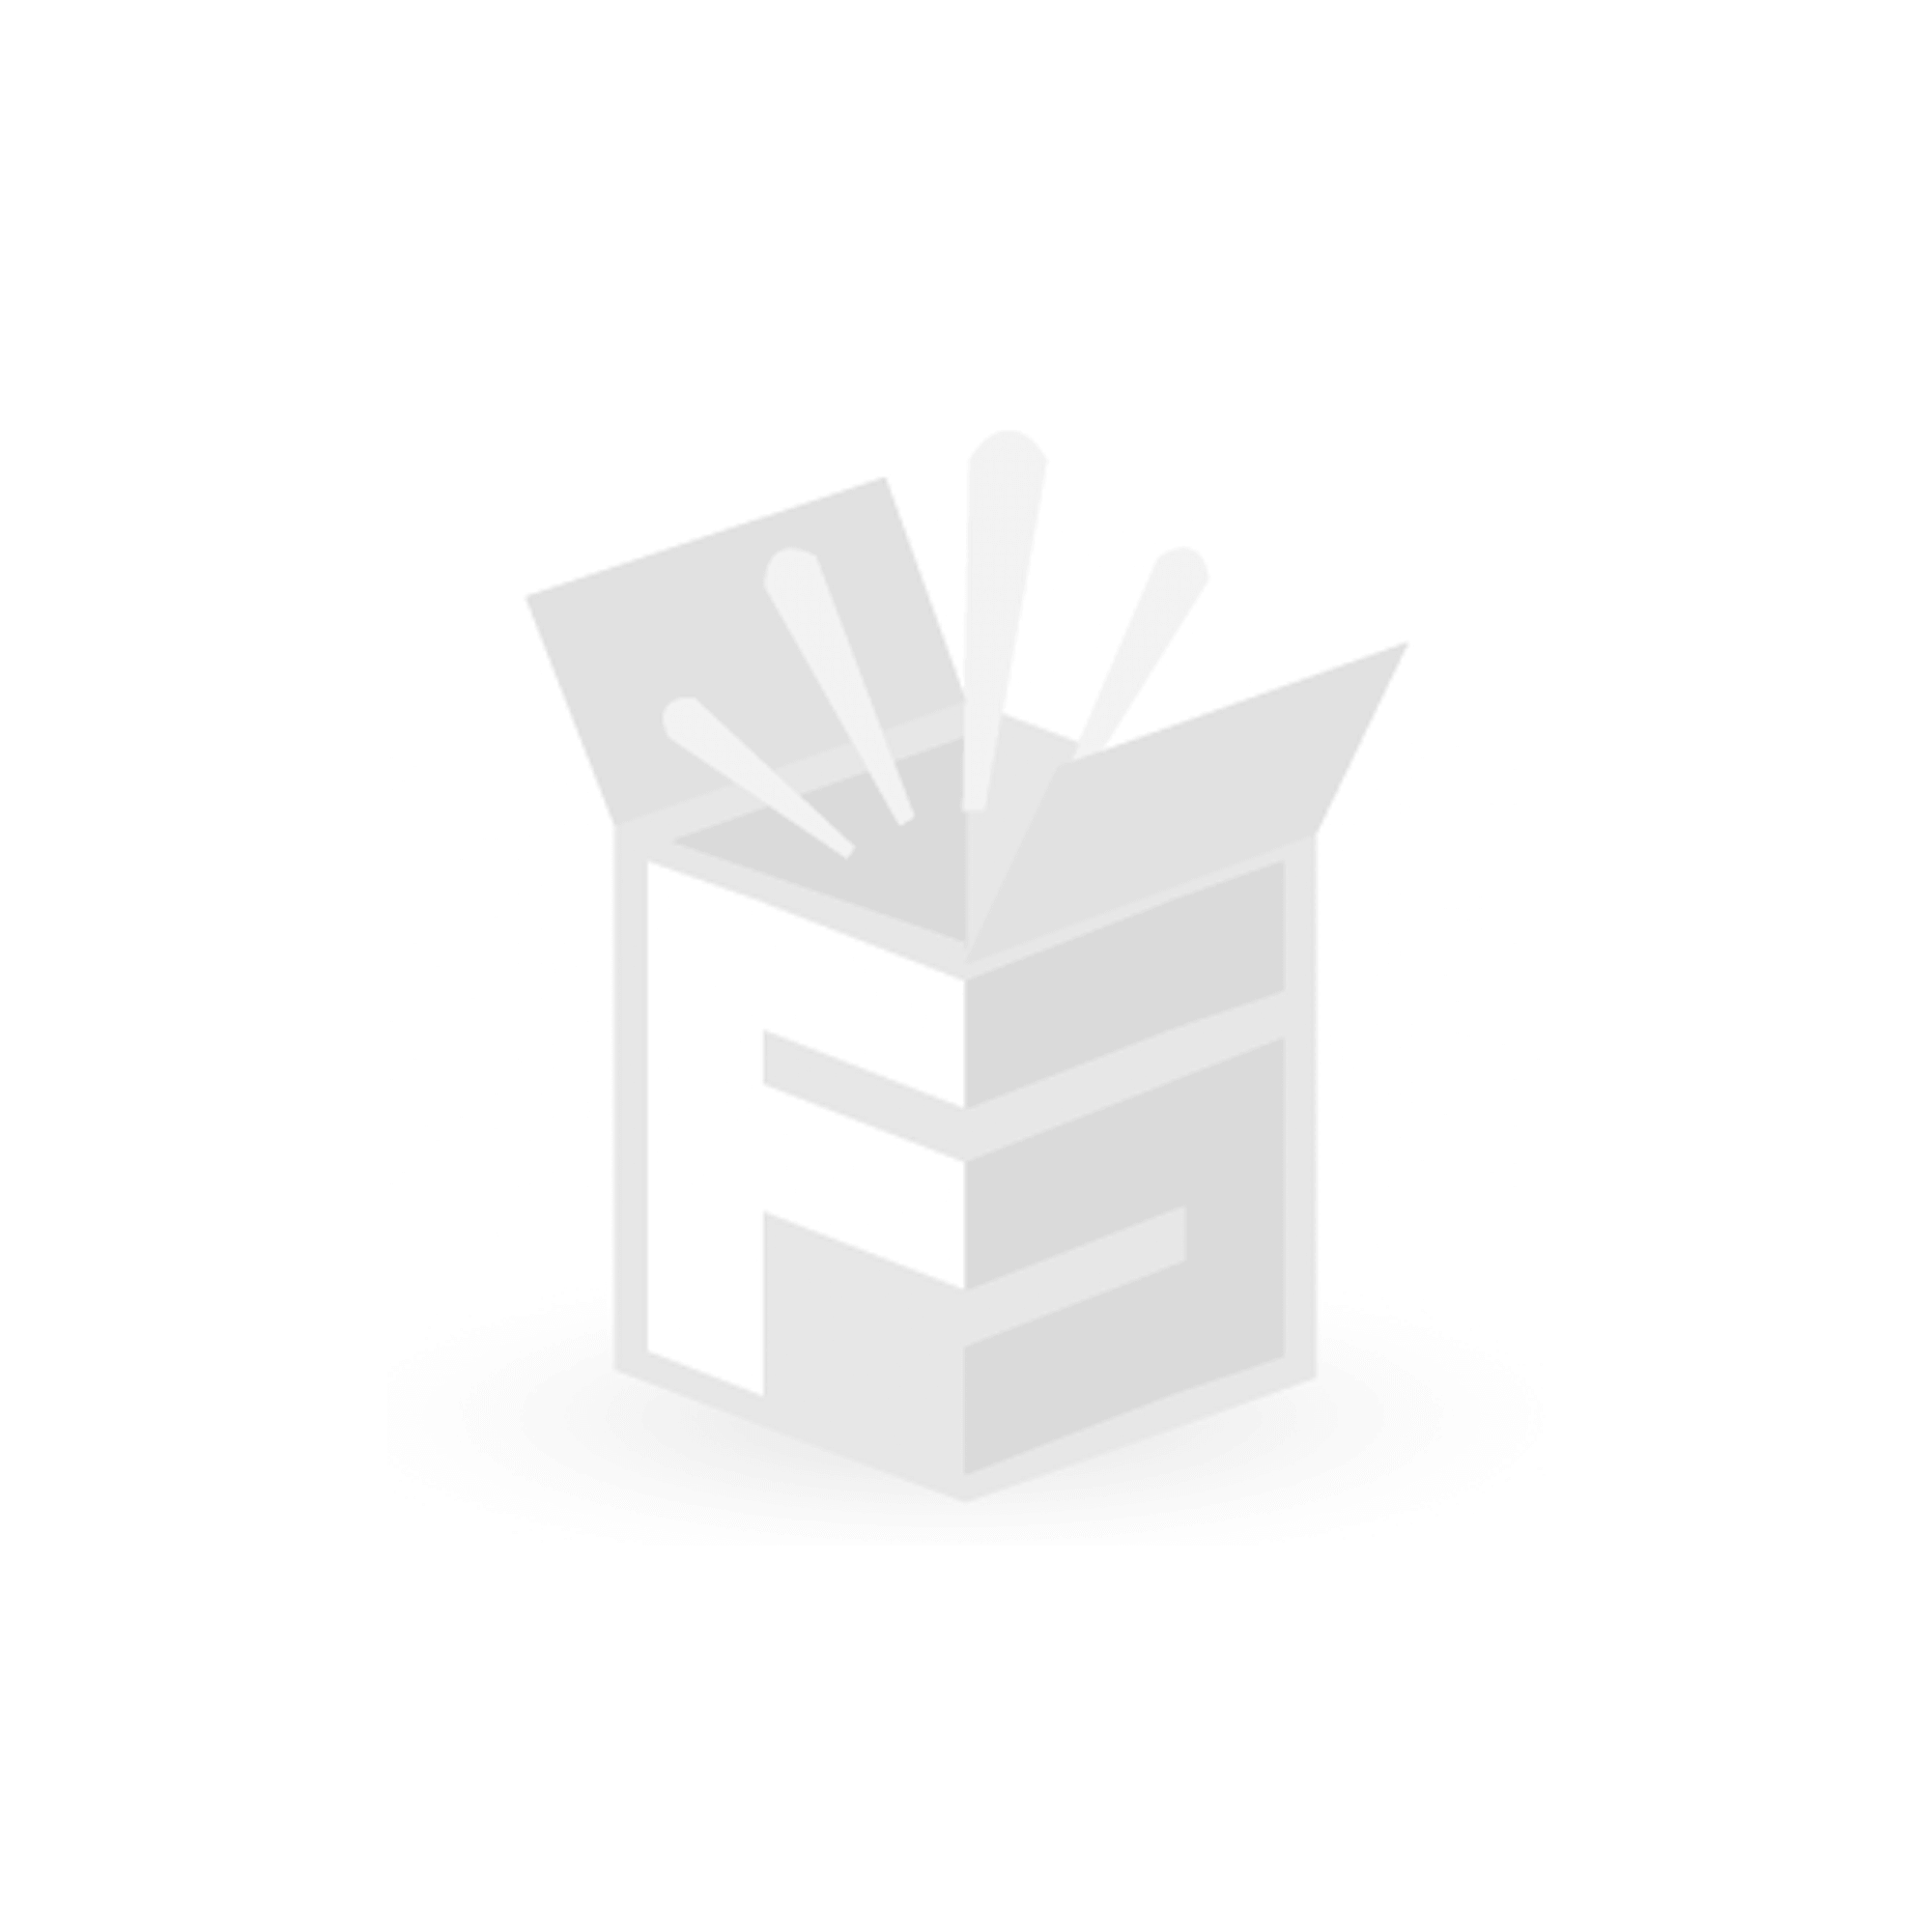 Kibernetik Stecker 1x CEE63A, 5-polig